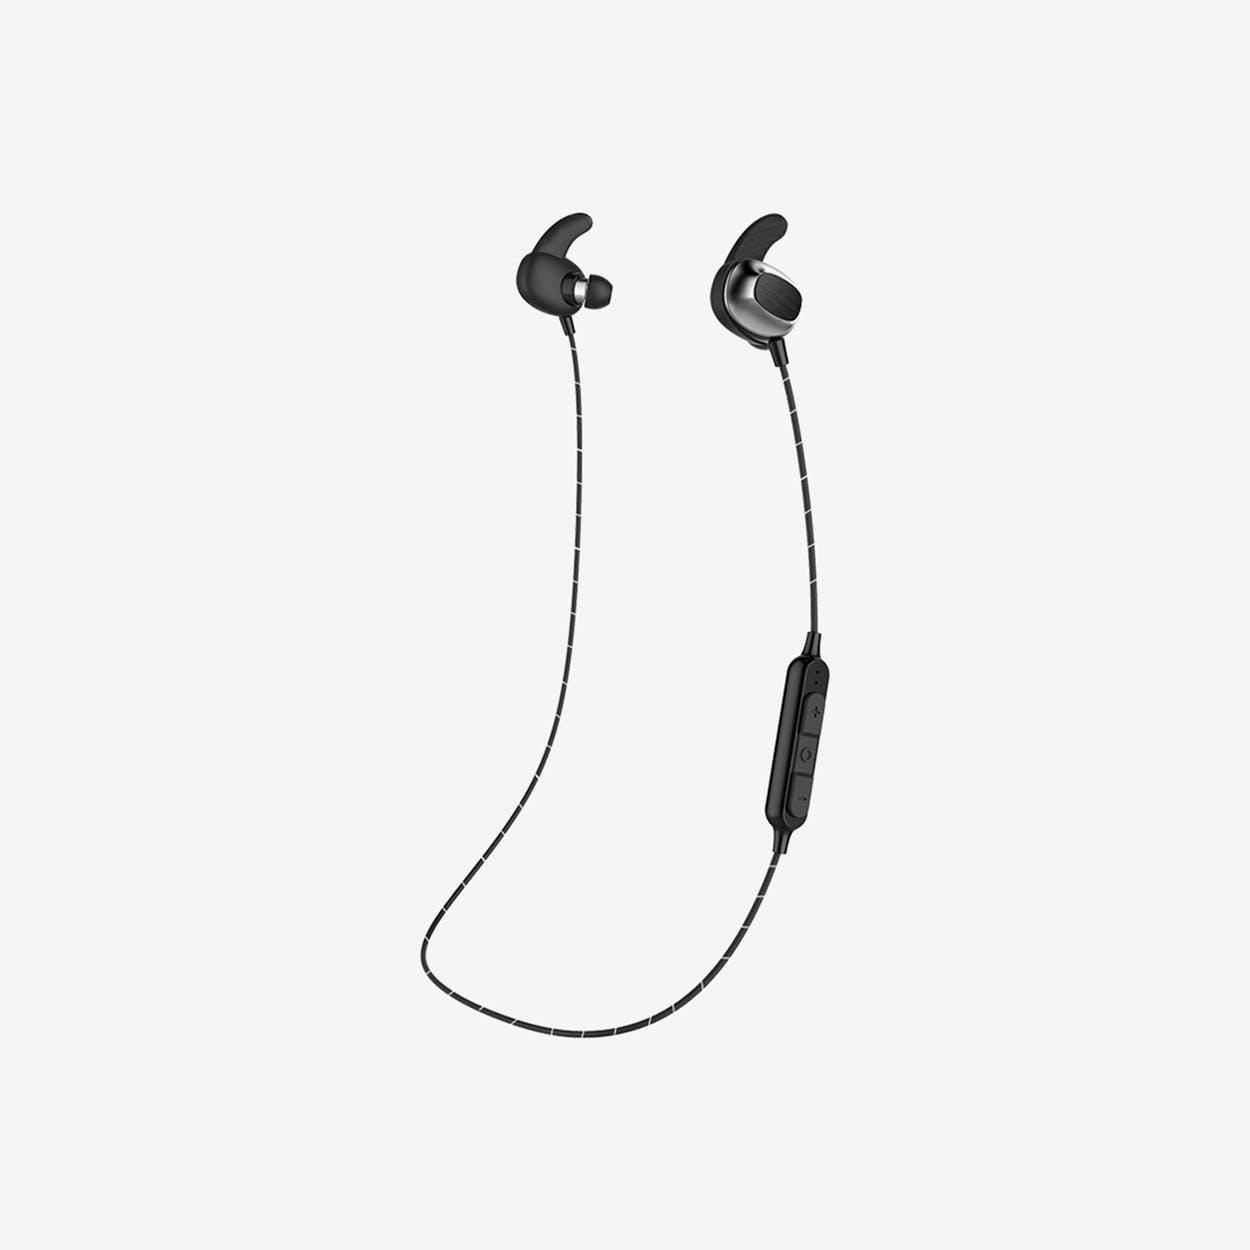 MAGNUSSEN M4 Bluetooth Wireless Earphones in Black & Silver